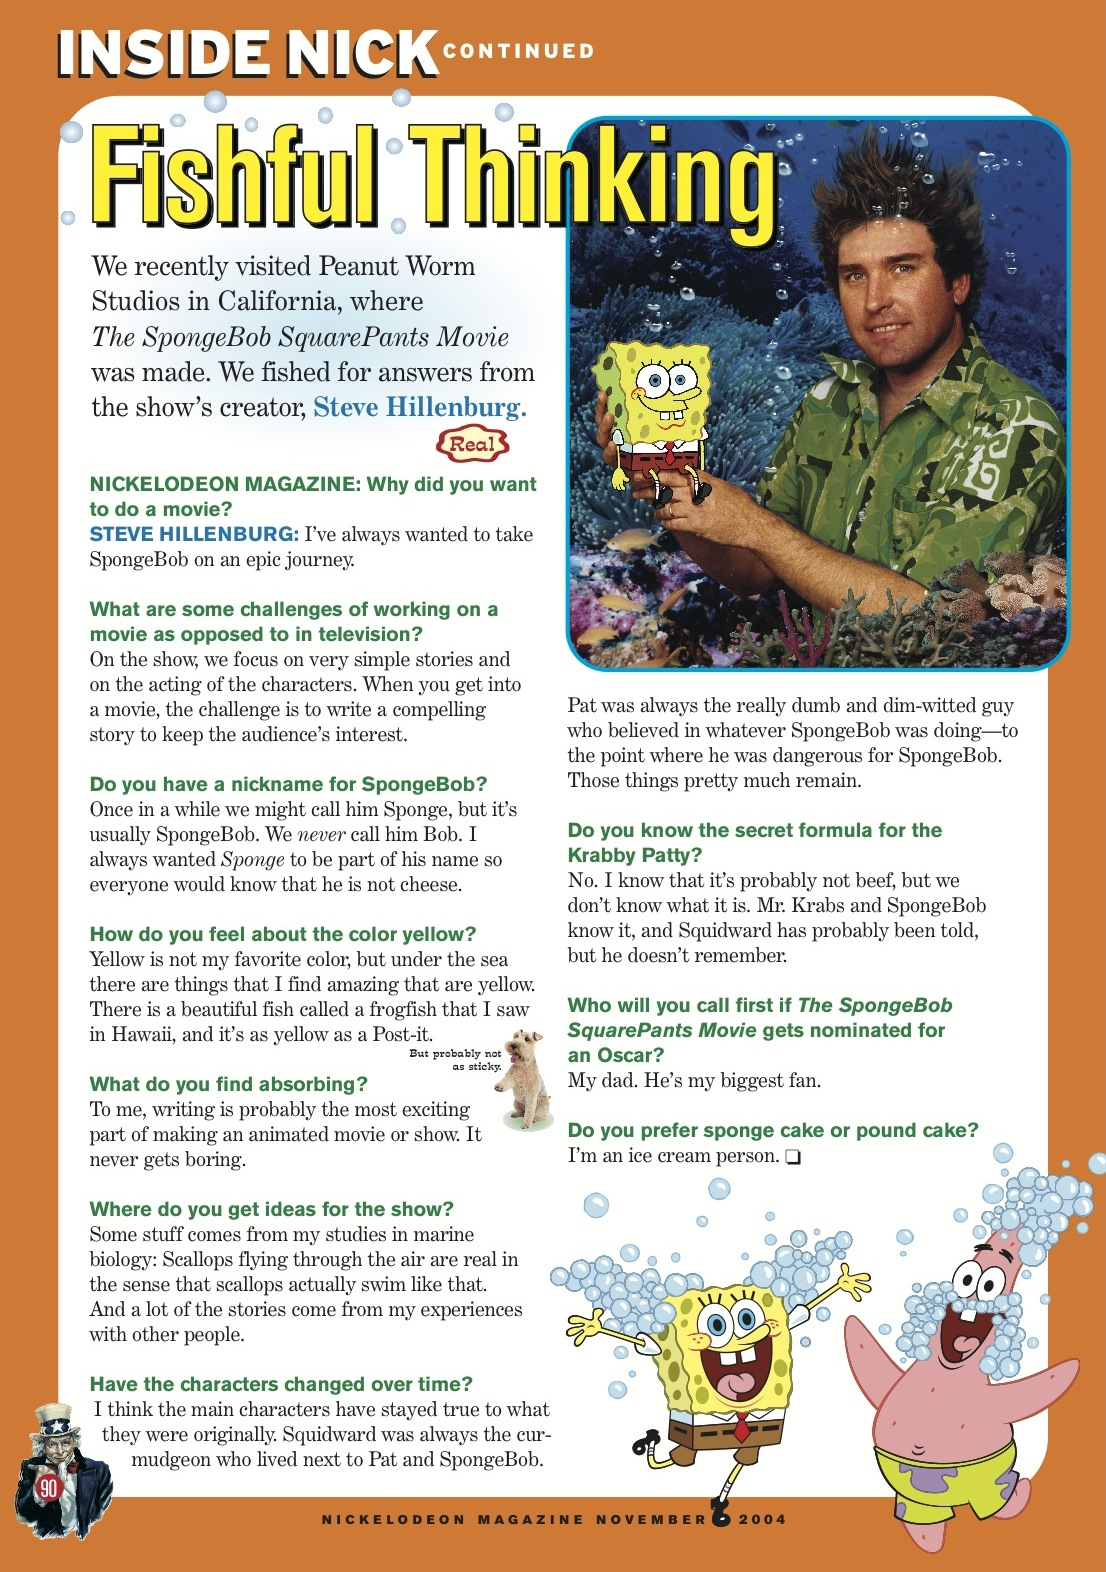 NickelodeonMagazine_Steve Hillenburg interview.jpg